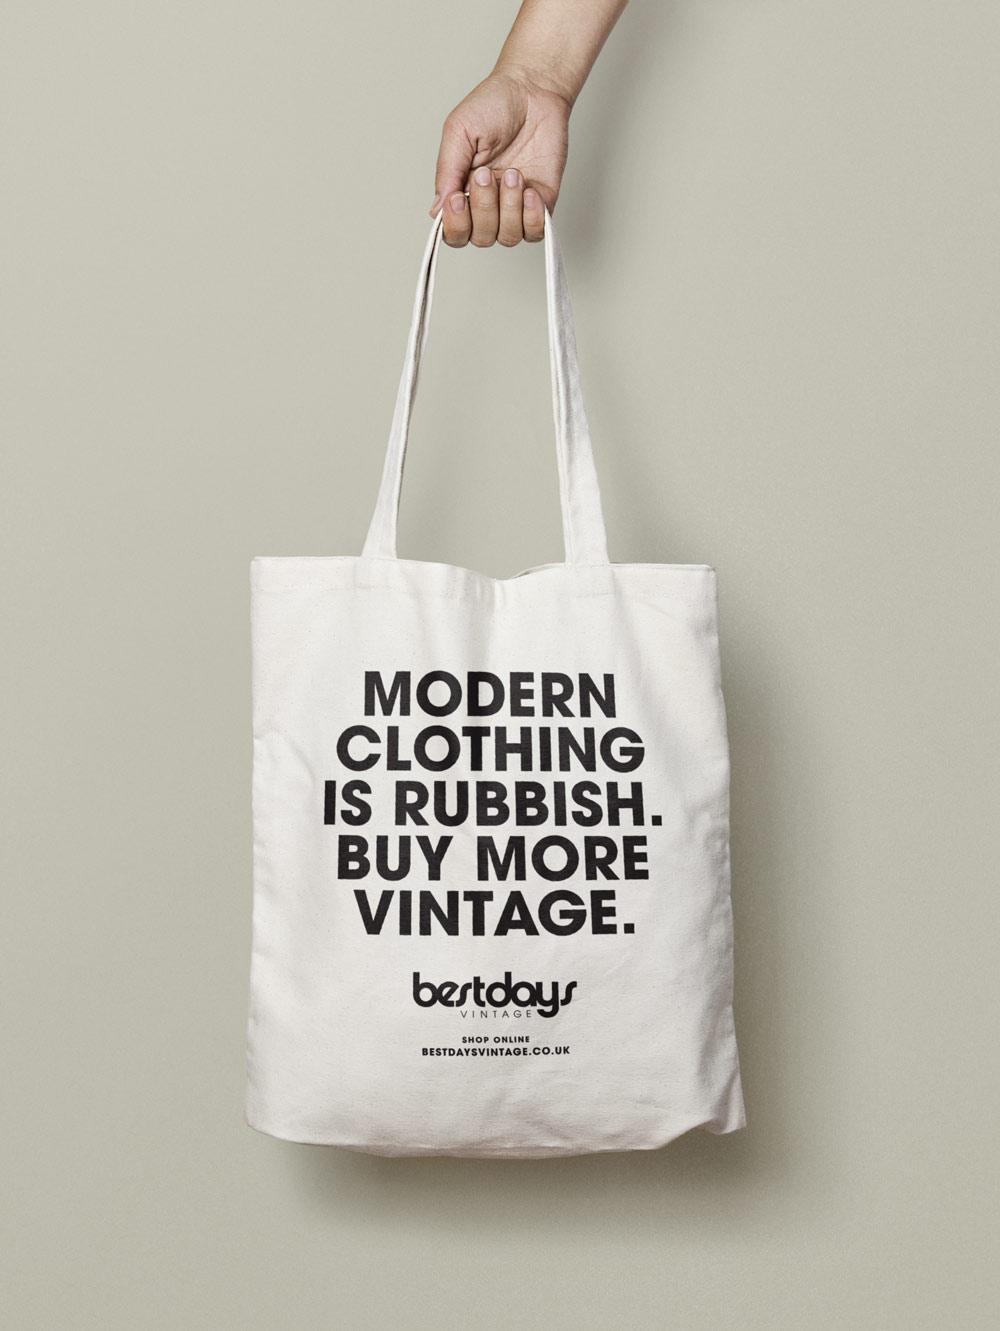 Typographic totebag design: modern clothing is rubbish. Buy more vintage. for clothing shop. Design by Brittany Hurdle beckon webeckon